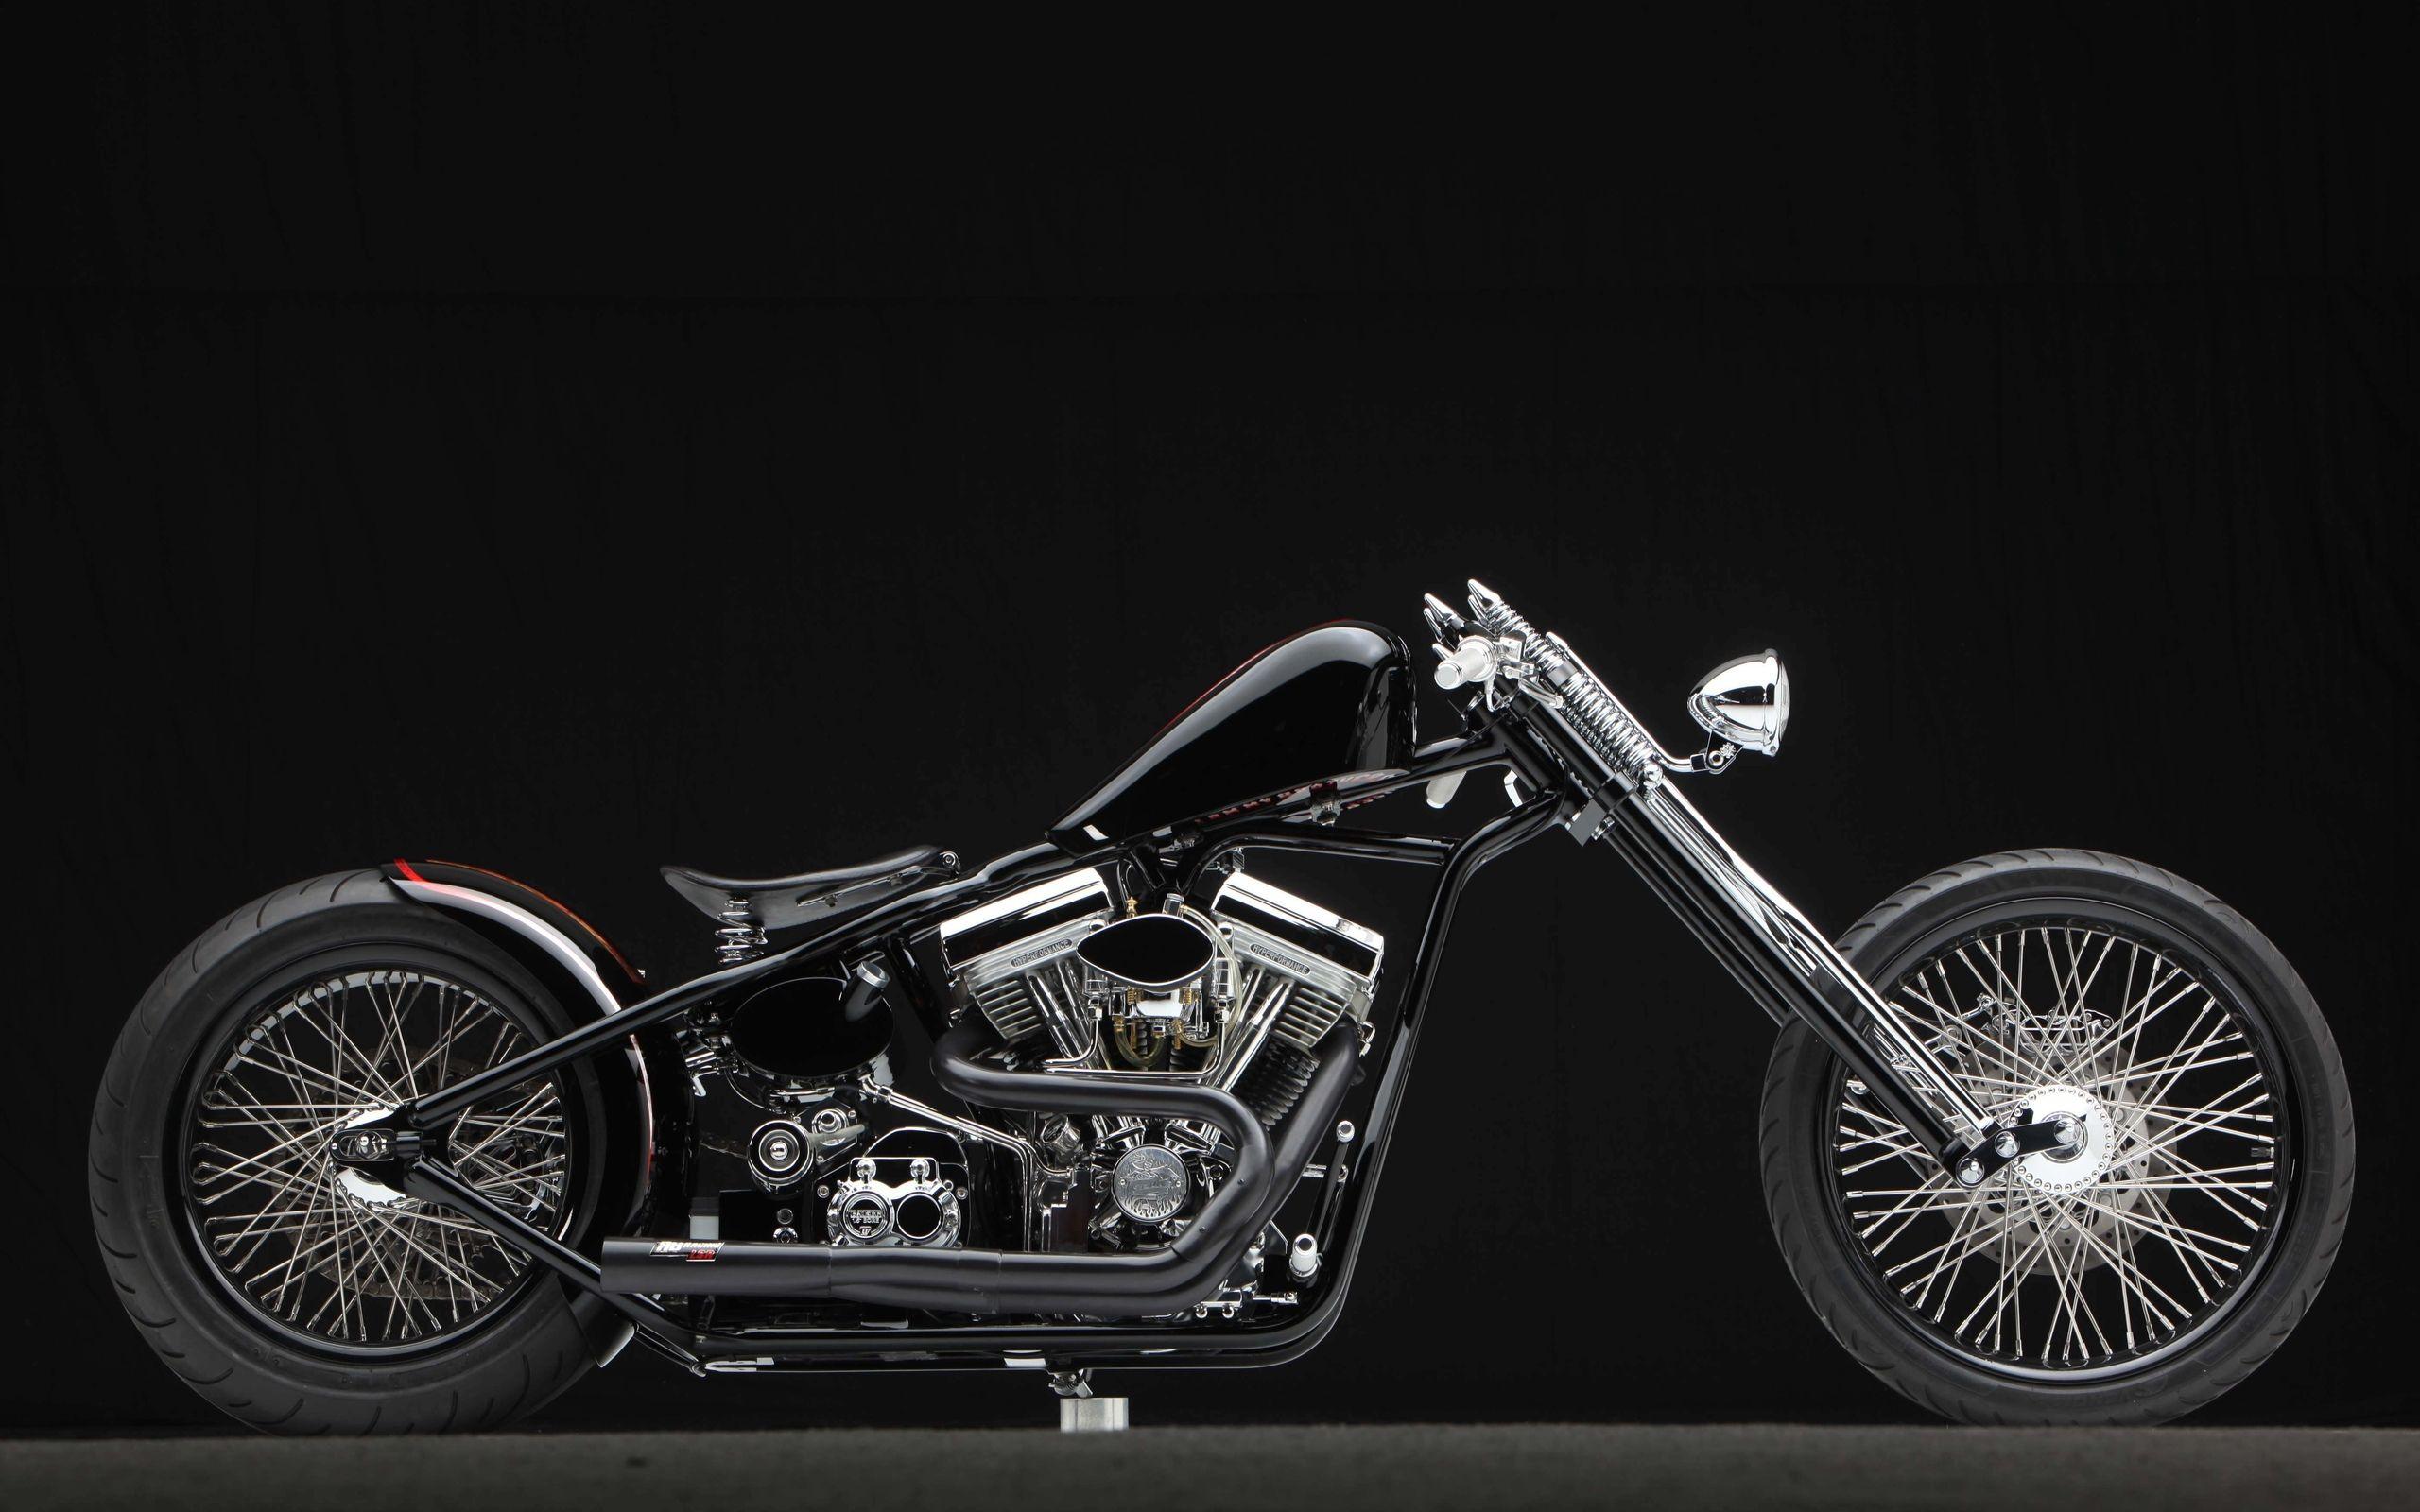 Black Chopper Pictures 07669 Baltana Badass Bike A Dream